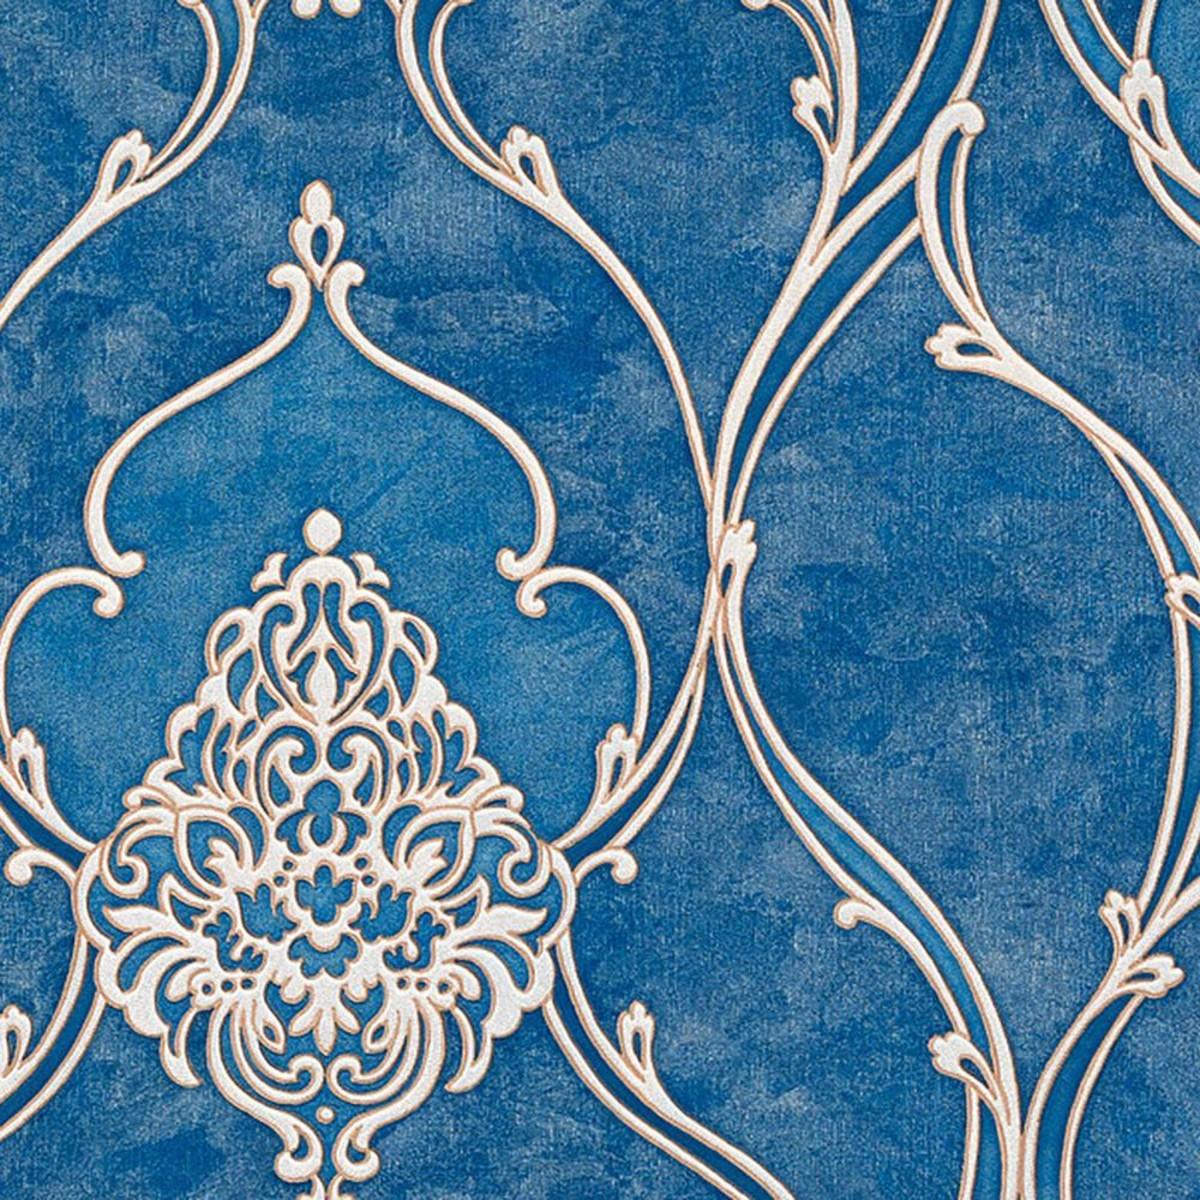 Обои флизелиновые Zambaiti Italica синие 1.06 м M5123